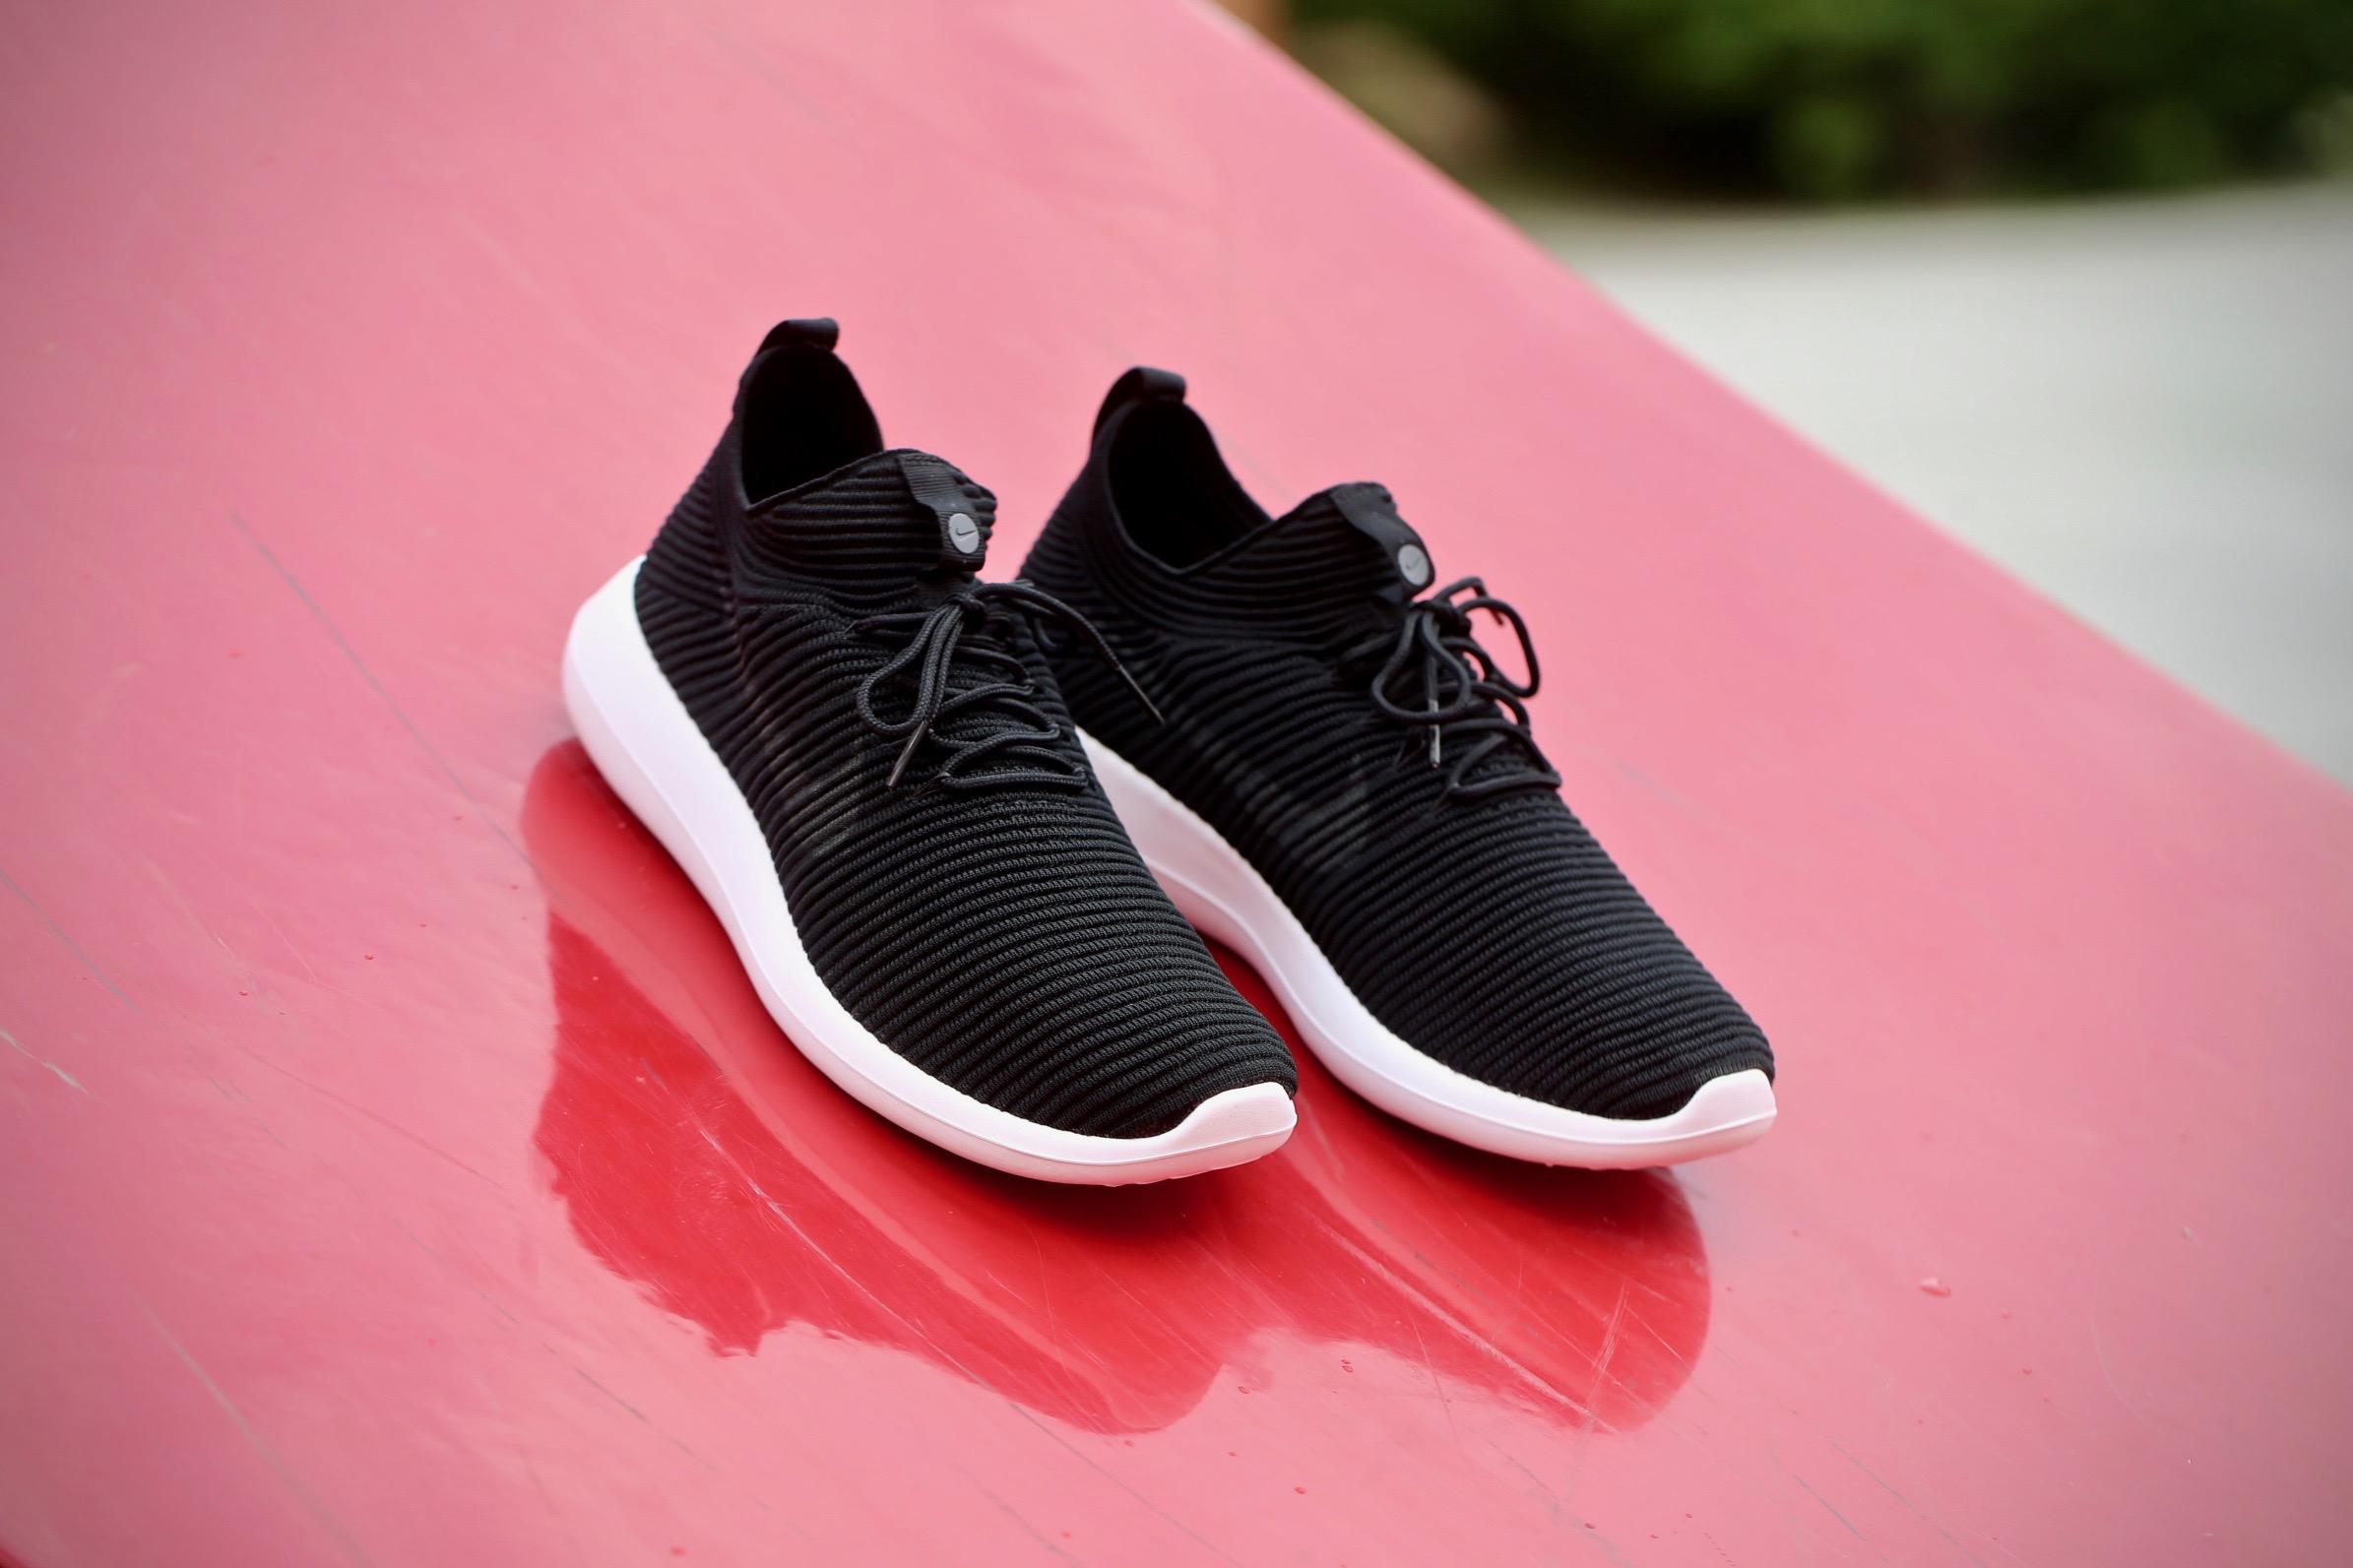 énorme réduction 6245b 451ff Nike Rosh Two Flyknit V2 - Black / White